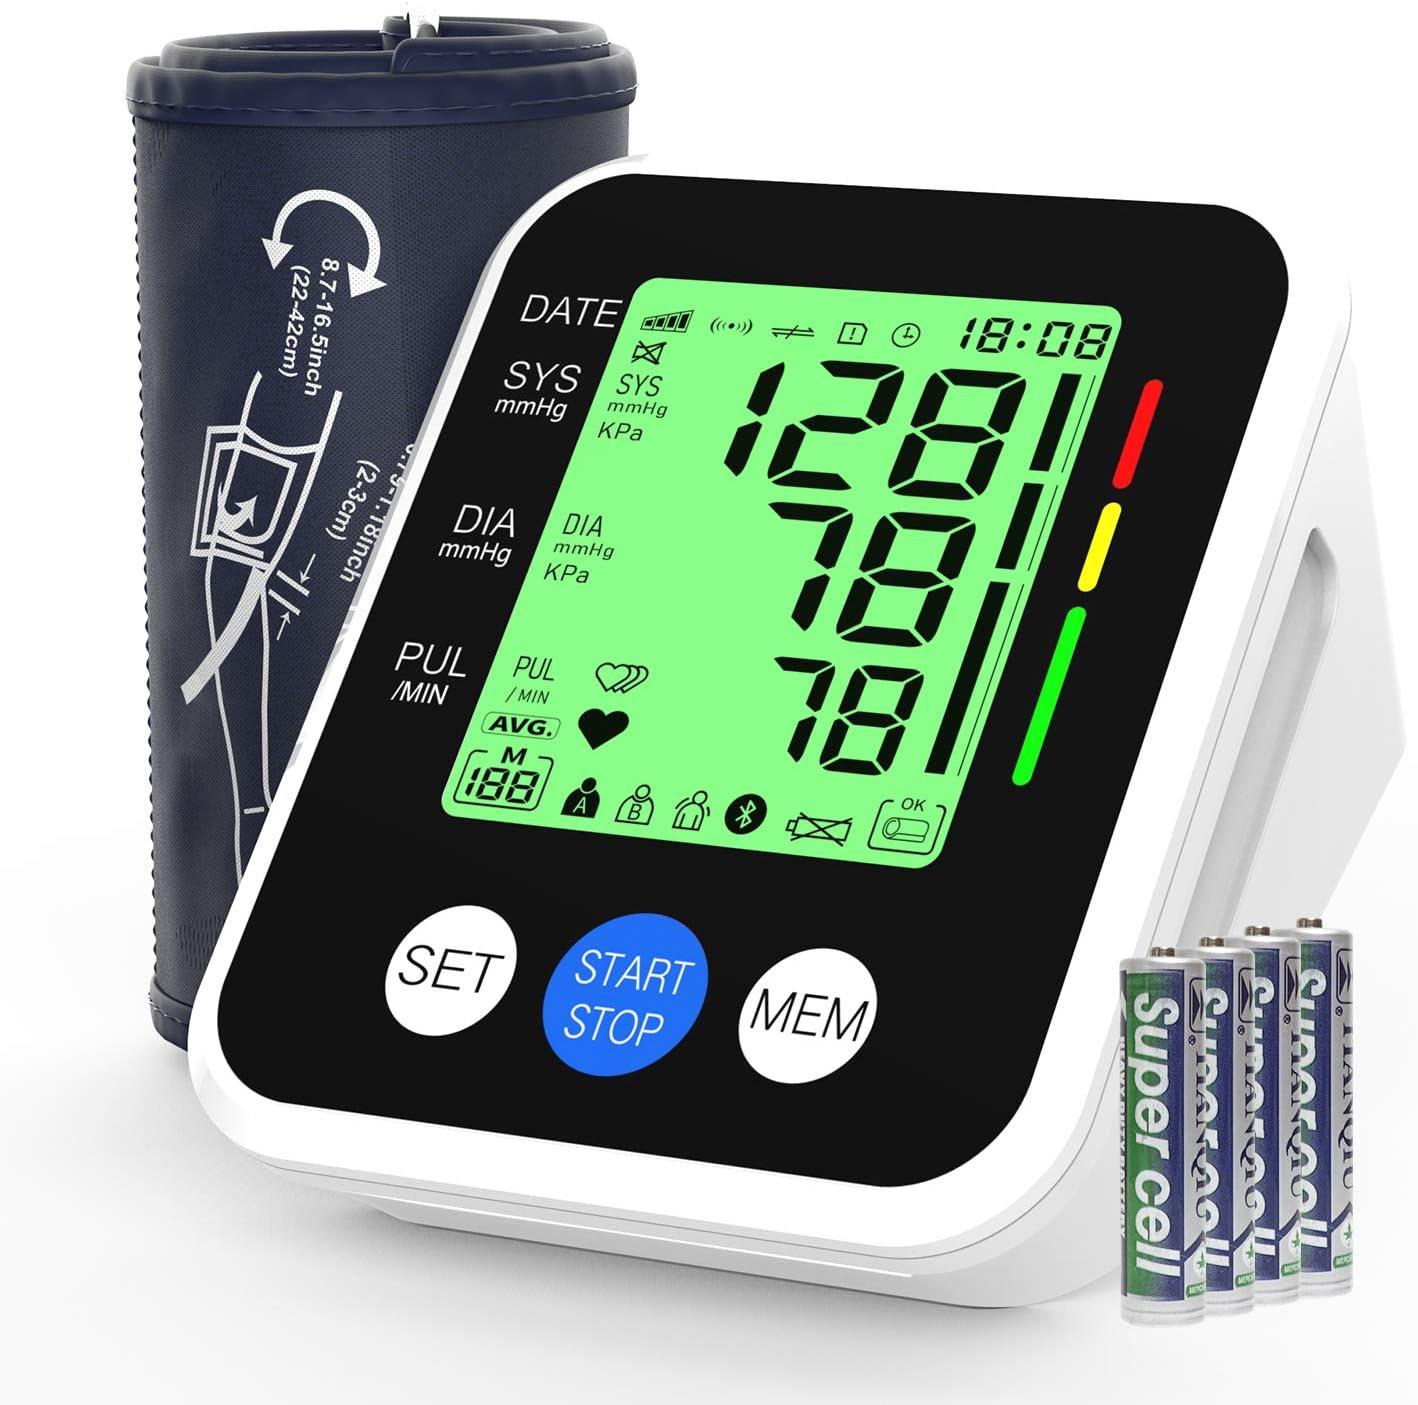 Tensiómetro de Brazo, AUCEE Tensiómetro de Brazo Digital con Detección de Arrítmia y Pantalla 3.5'' Gran pantalla LED retroiluminada, 2 Memorias de Usuario(2 * 99)